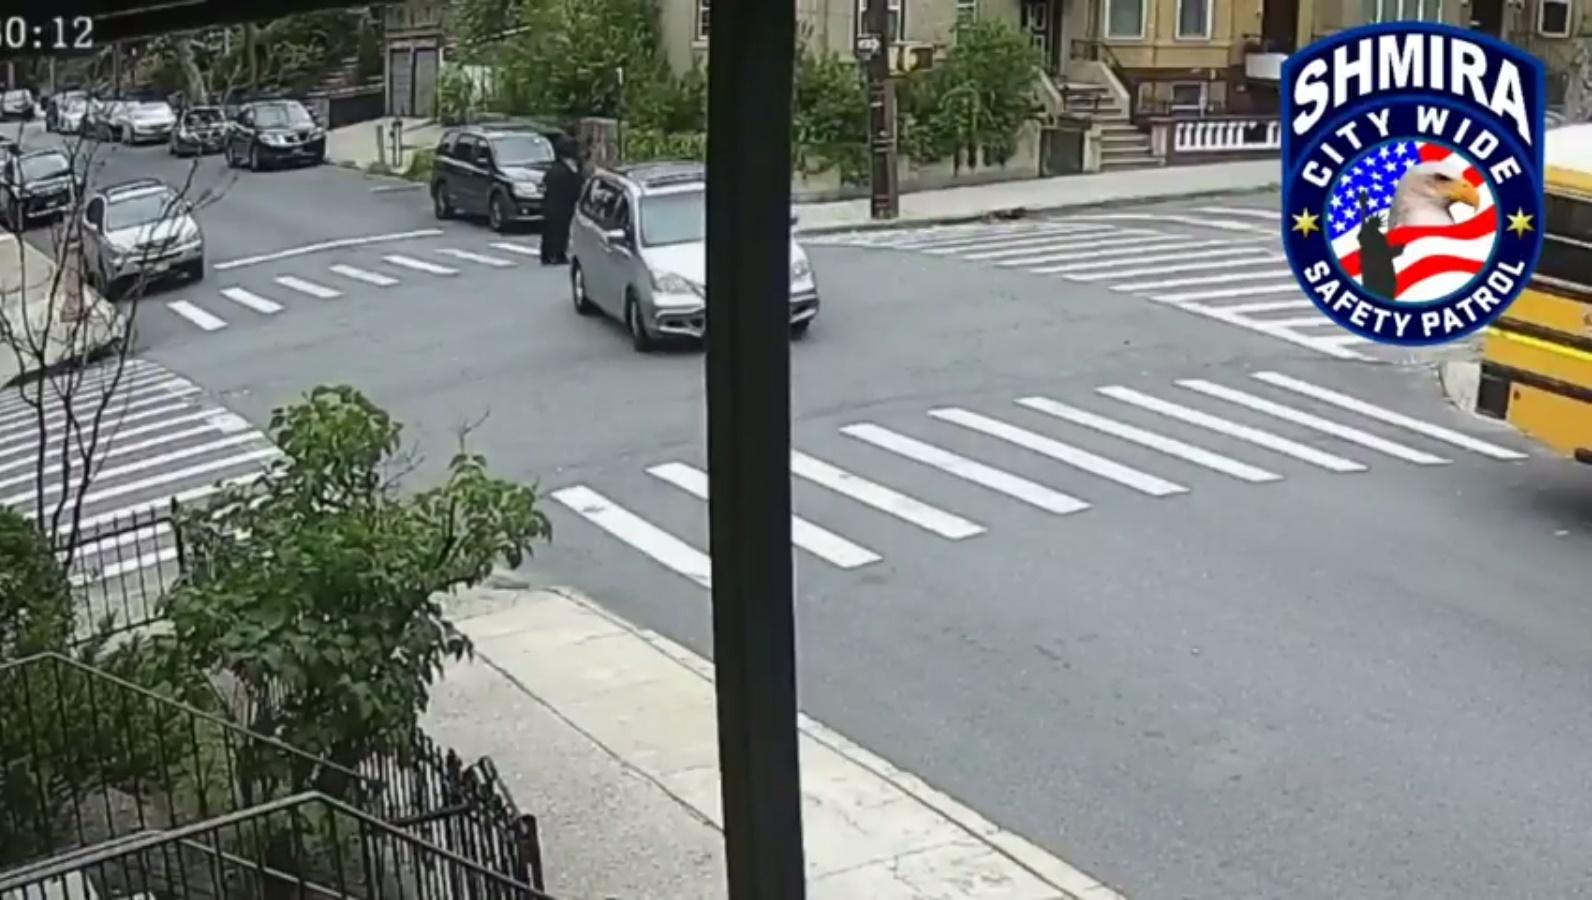 Brooklyn, NY - Community Leaders Slam NYPD For Ignoring